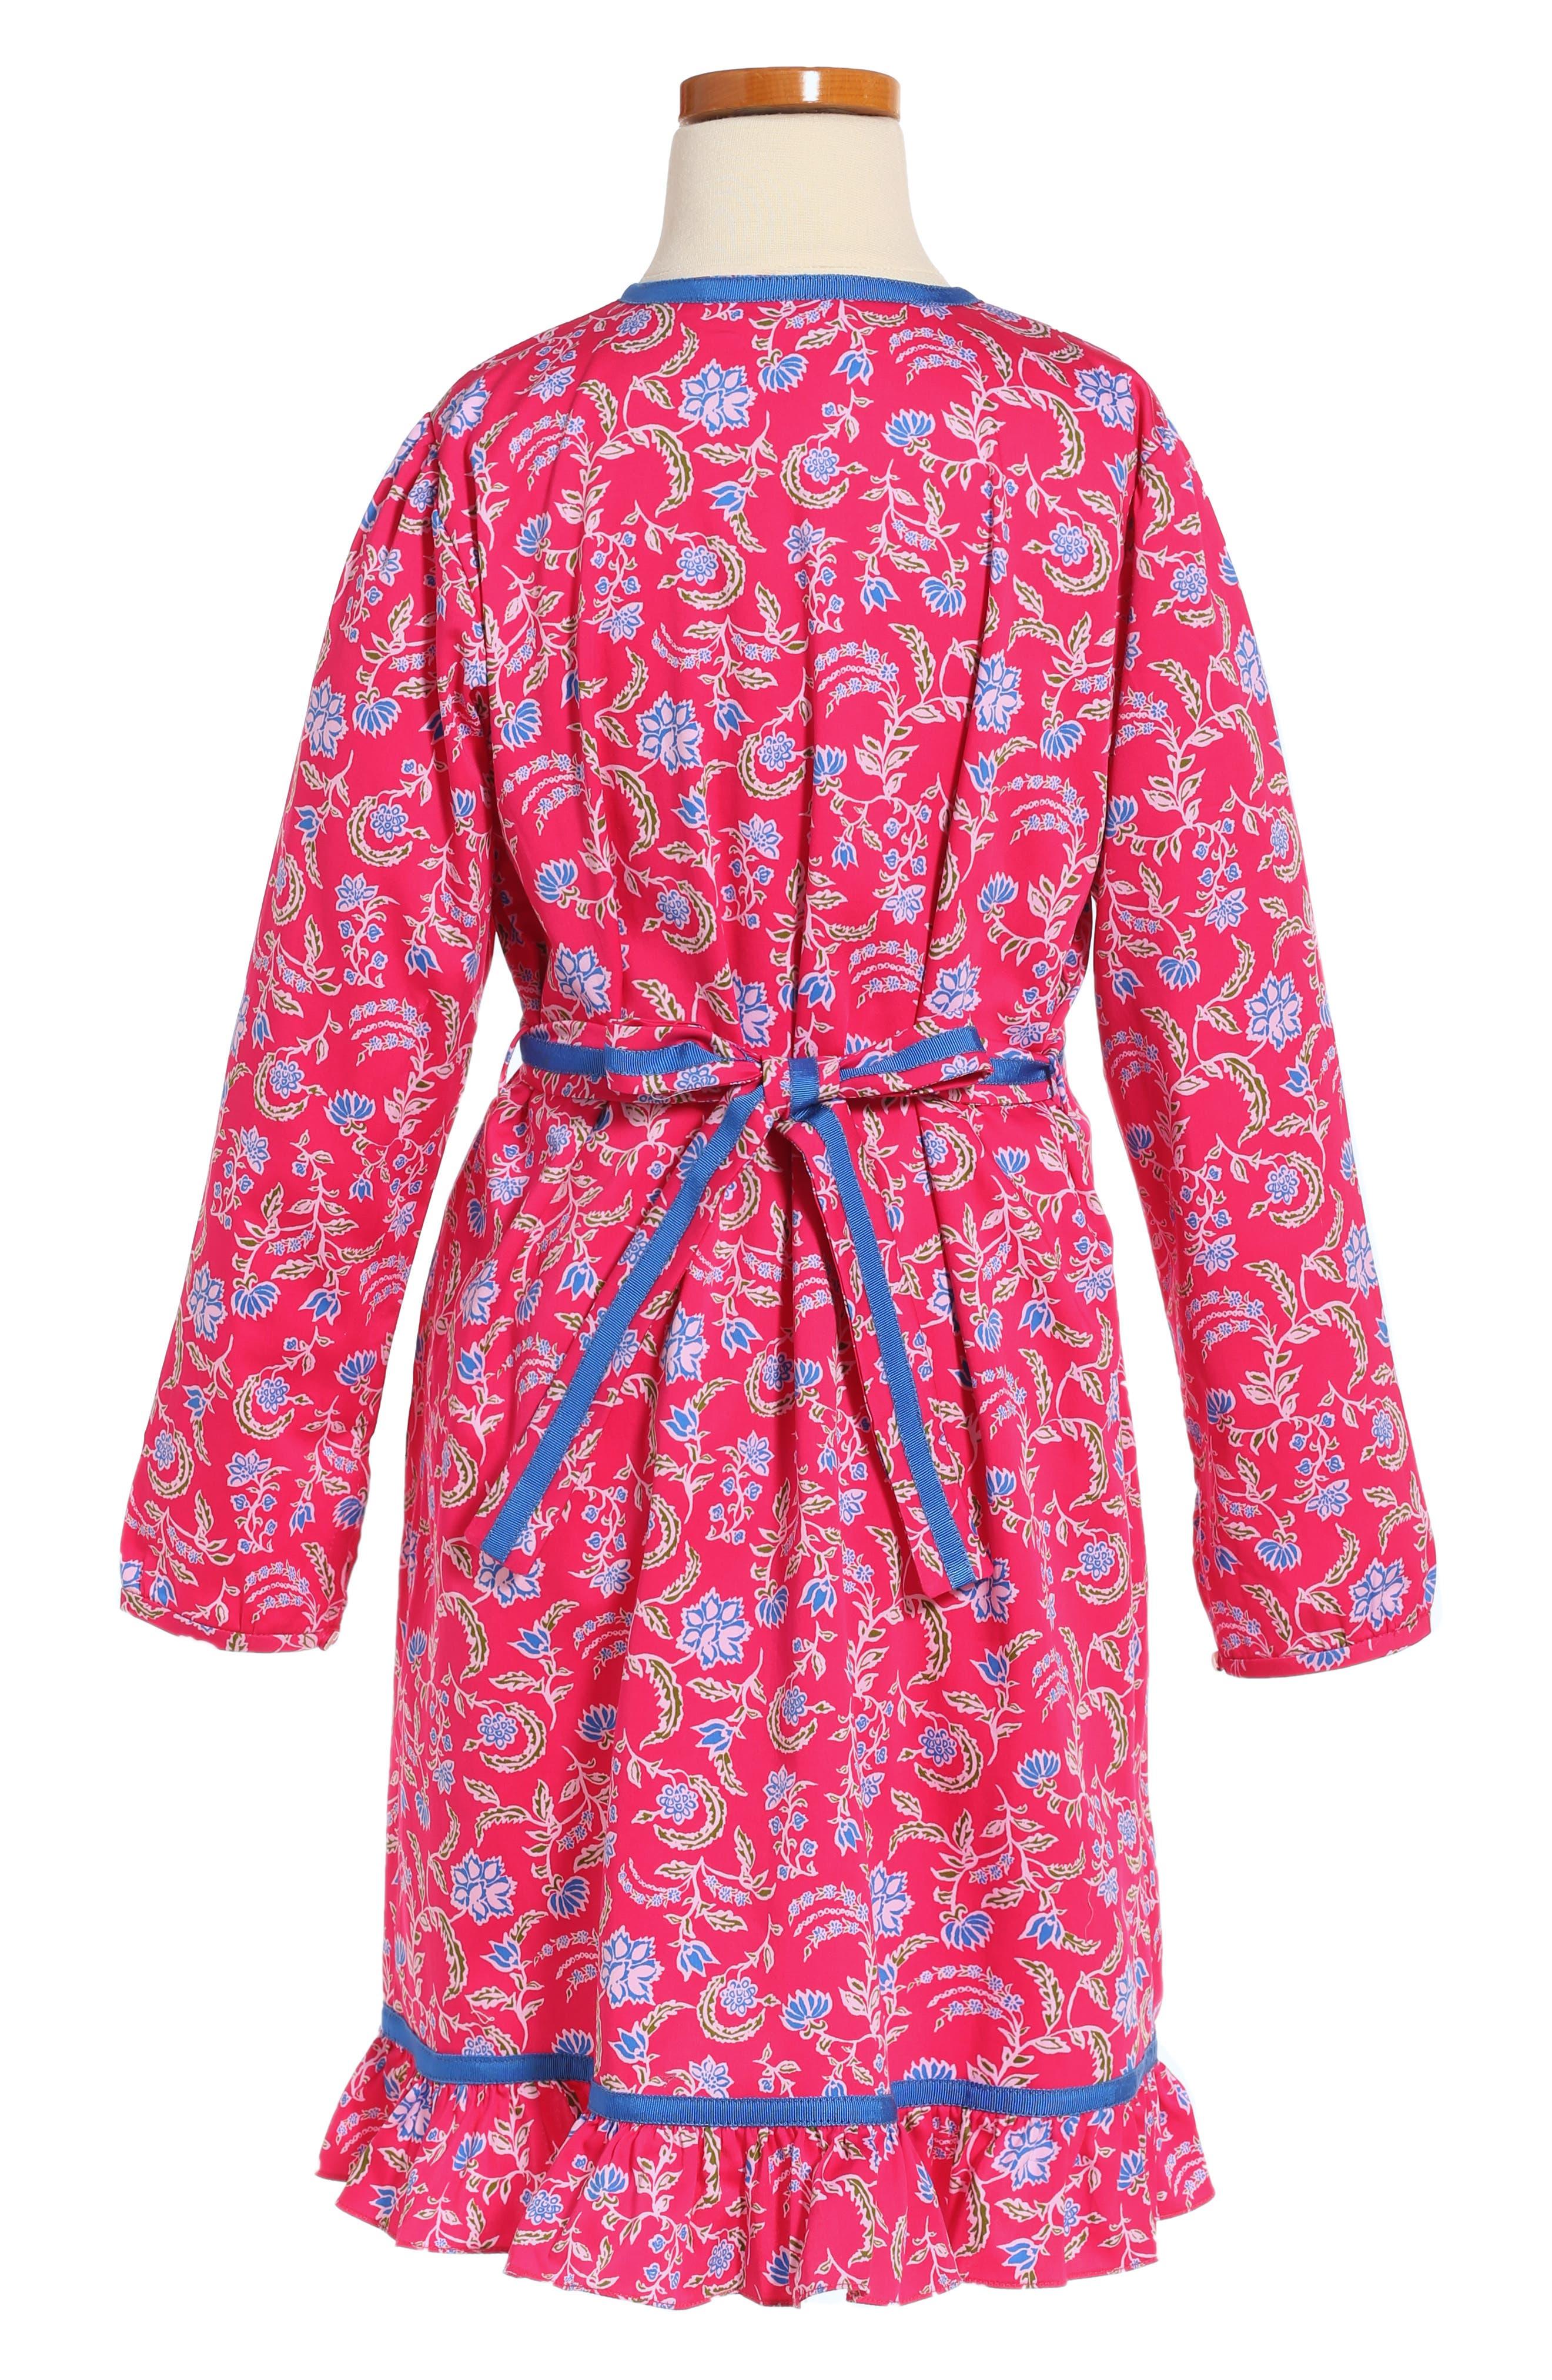 Lotus Flower Dress,                             Alternate thumbnail 2, color,                             696